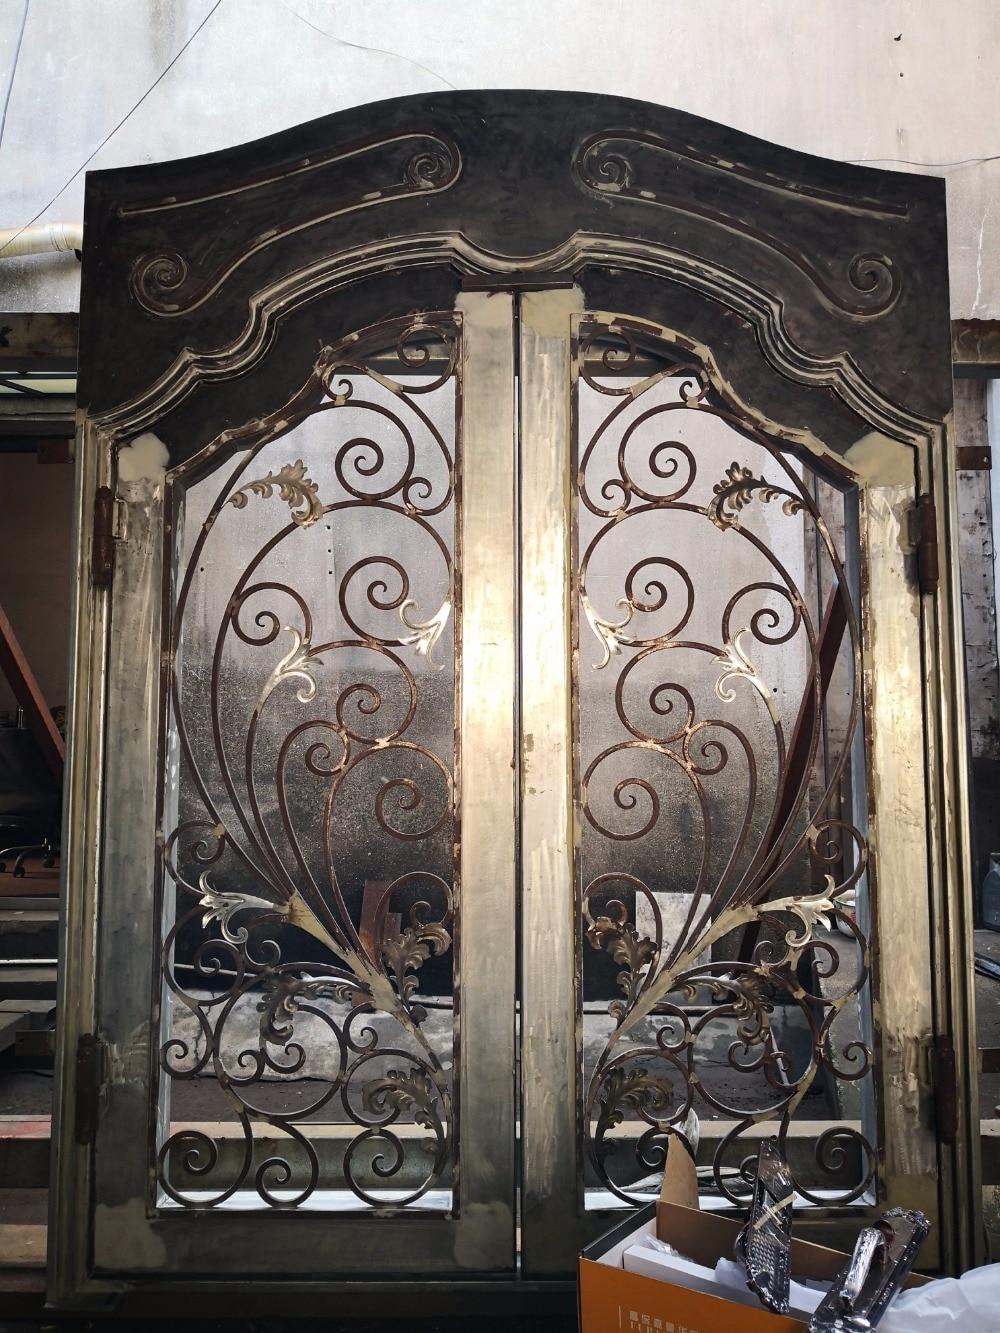 Custom Safety Door Grill Gate Grilles Fences Railings: Iron Safety Door Custom Wrought Iron Entry Doors-in Doors